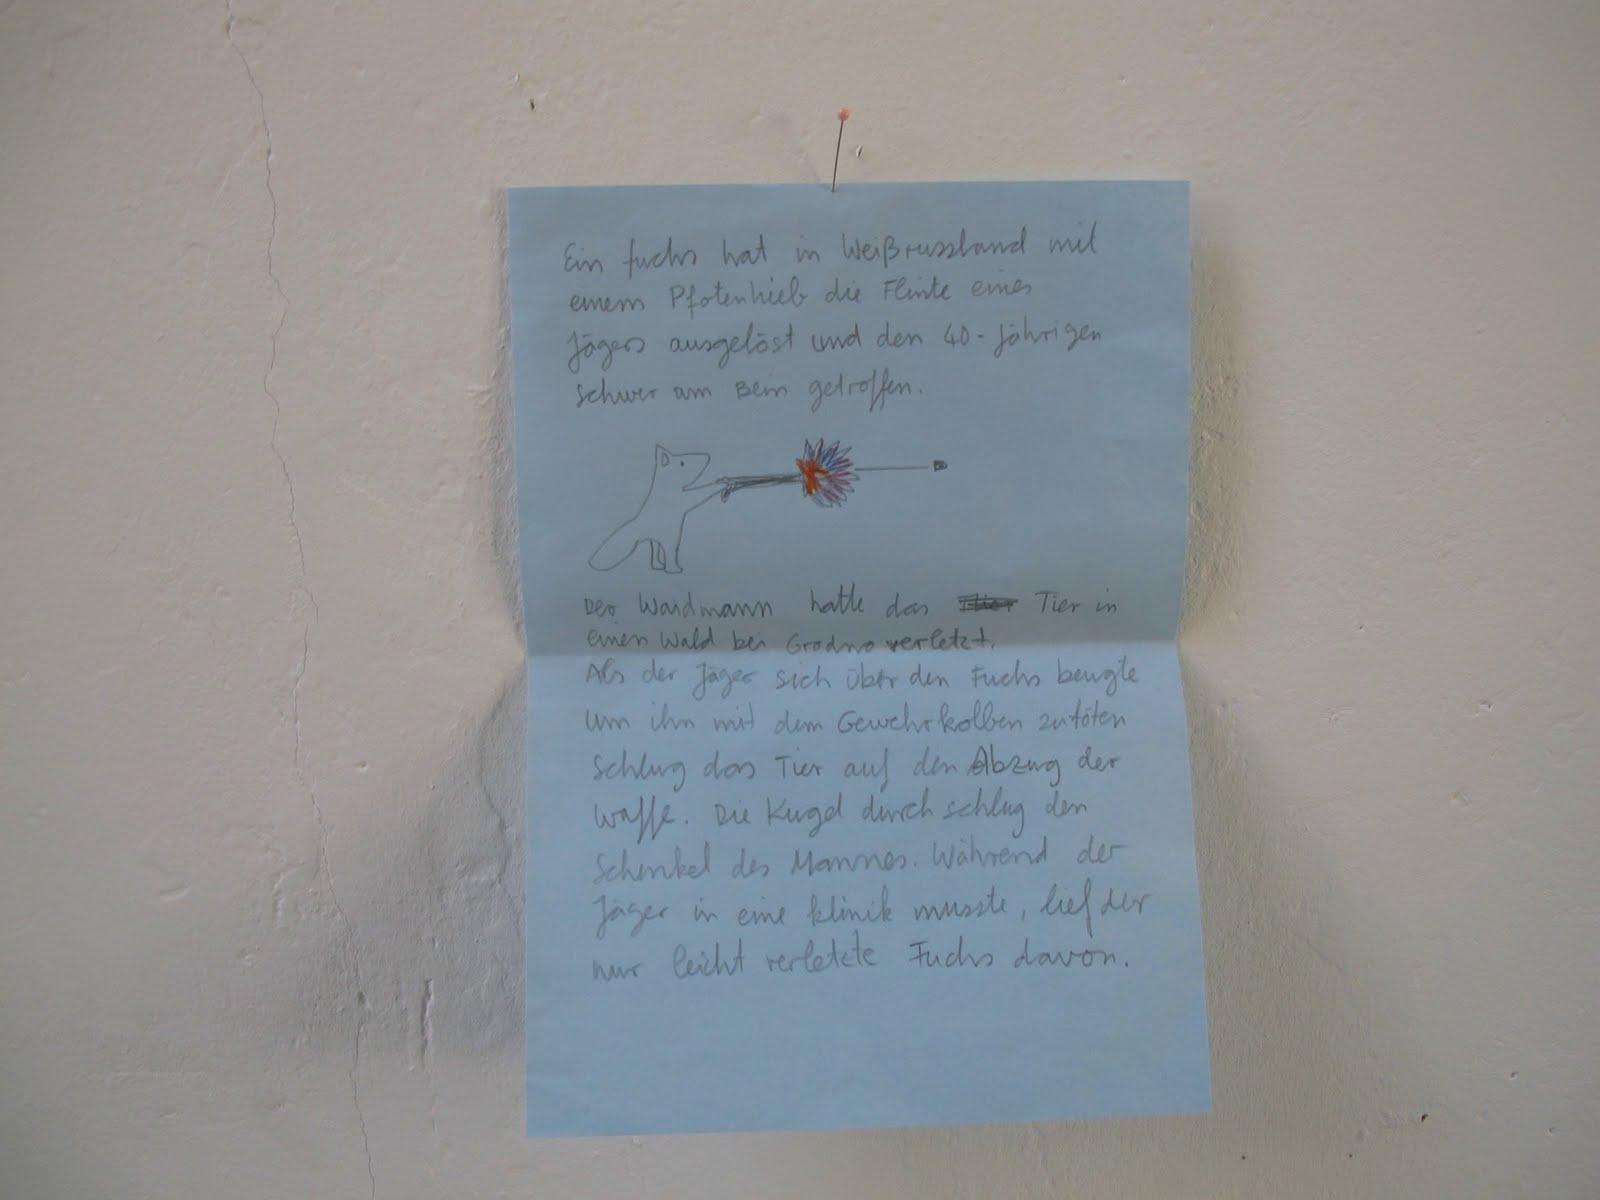 Papers joseph research Mla gibaldi writers